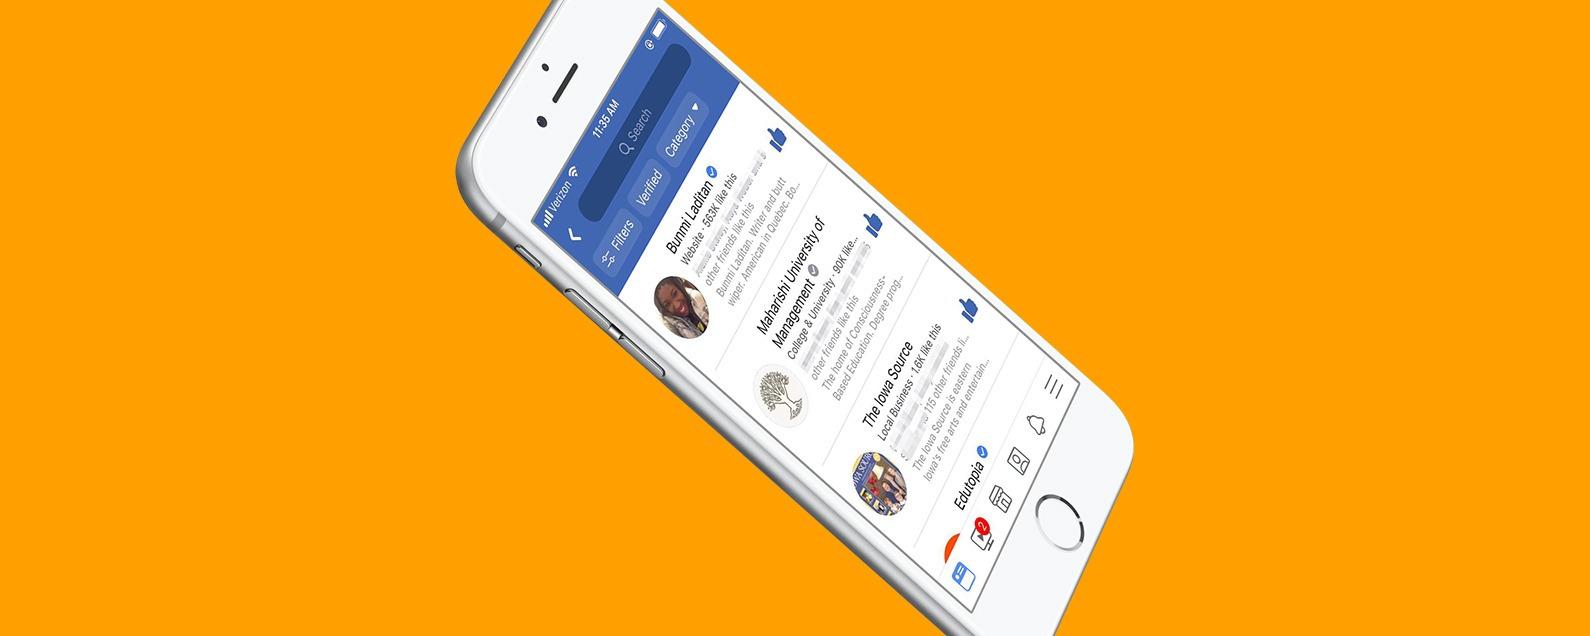 how to delete facebook app iphone 8